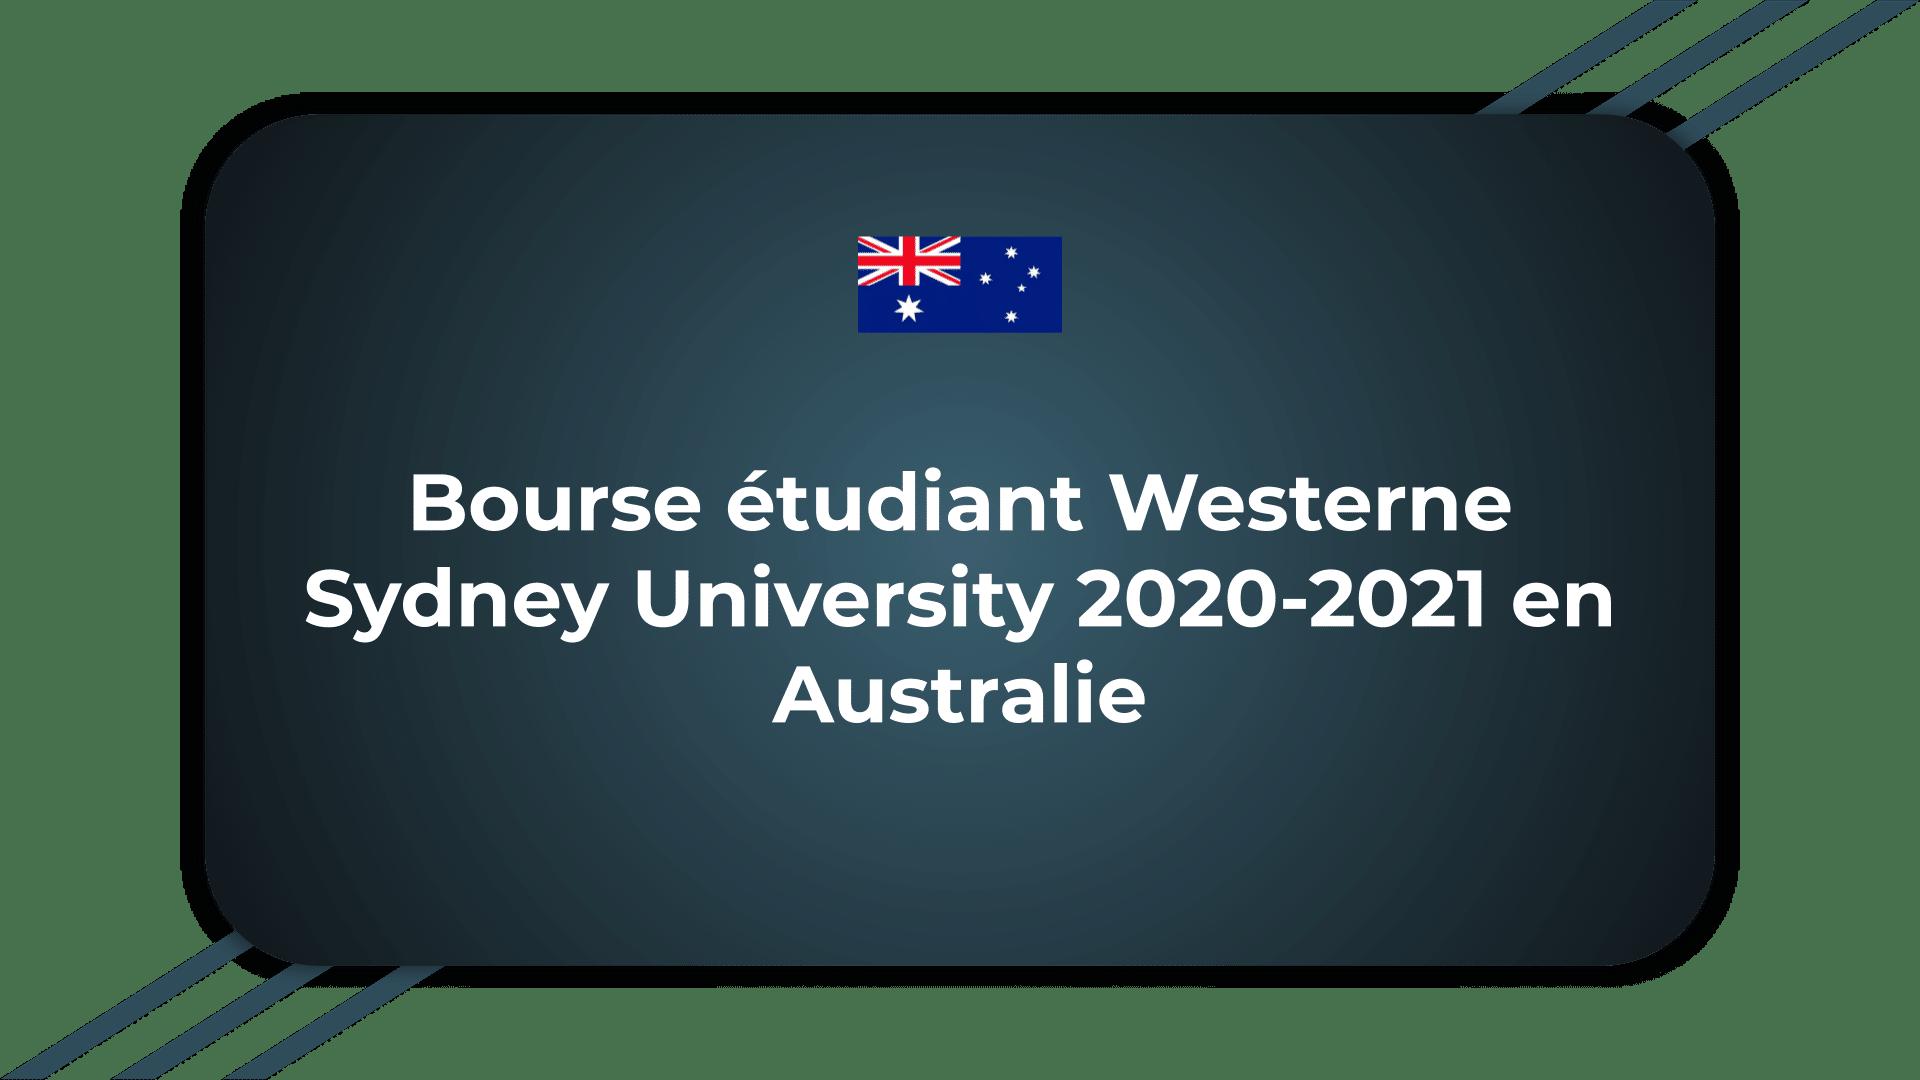 Bourse étudiant Westerne Sydney University